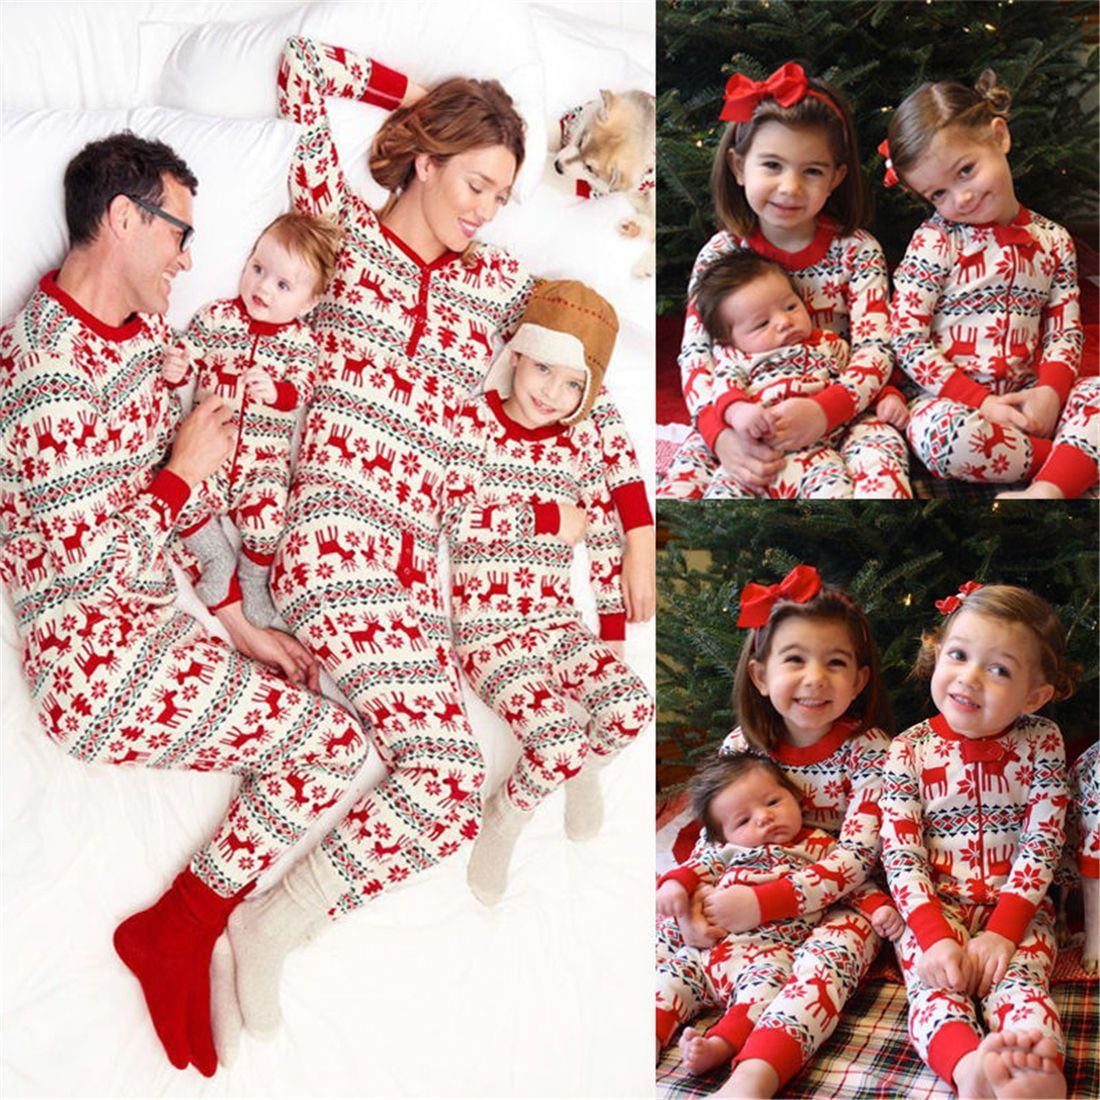 ee6dea1e9 Christmas Sleep Wear Winter Mother Father Kids Newborn Two Pieces ...